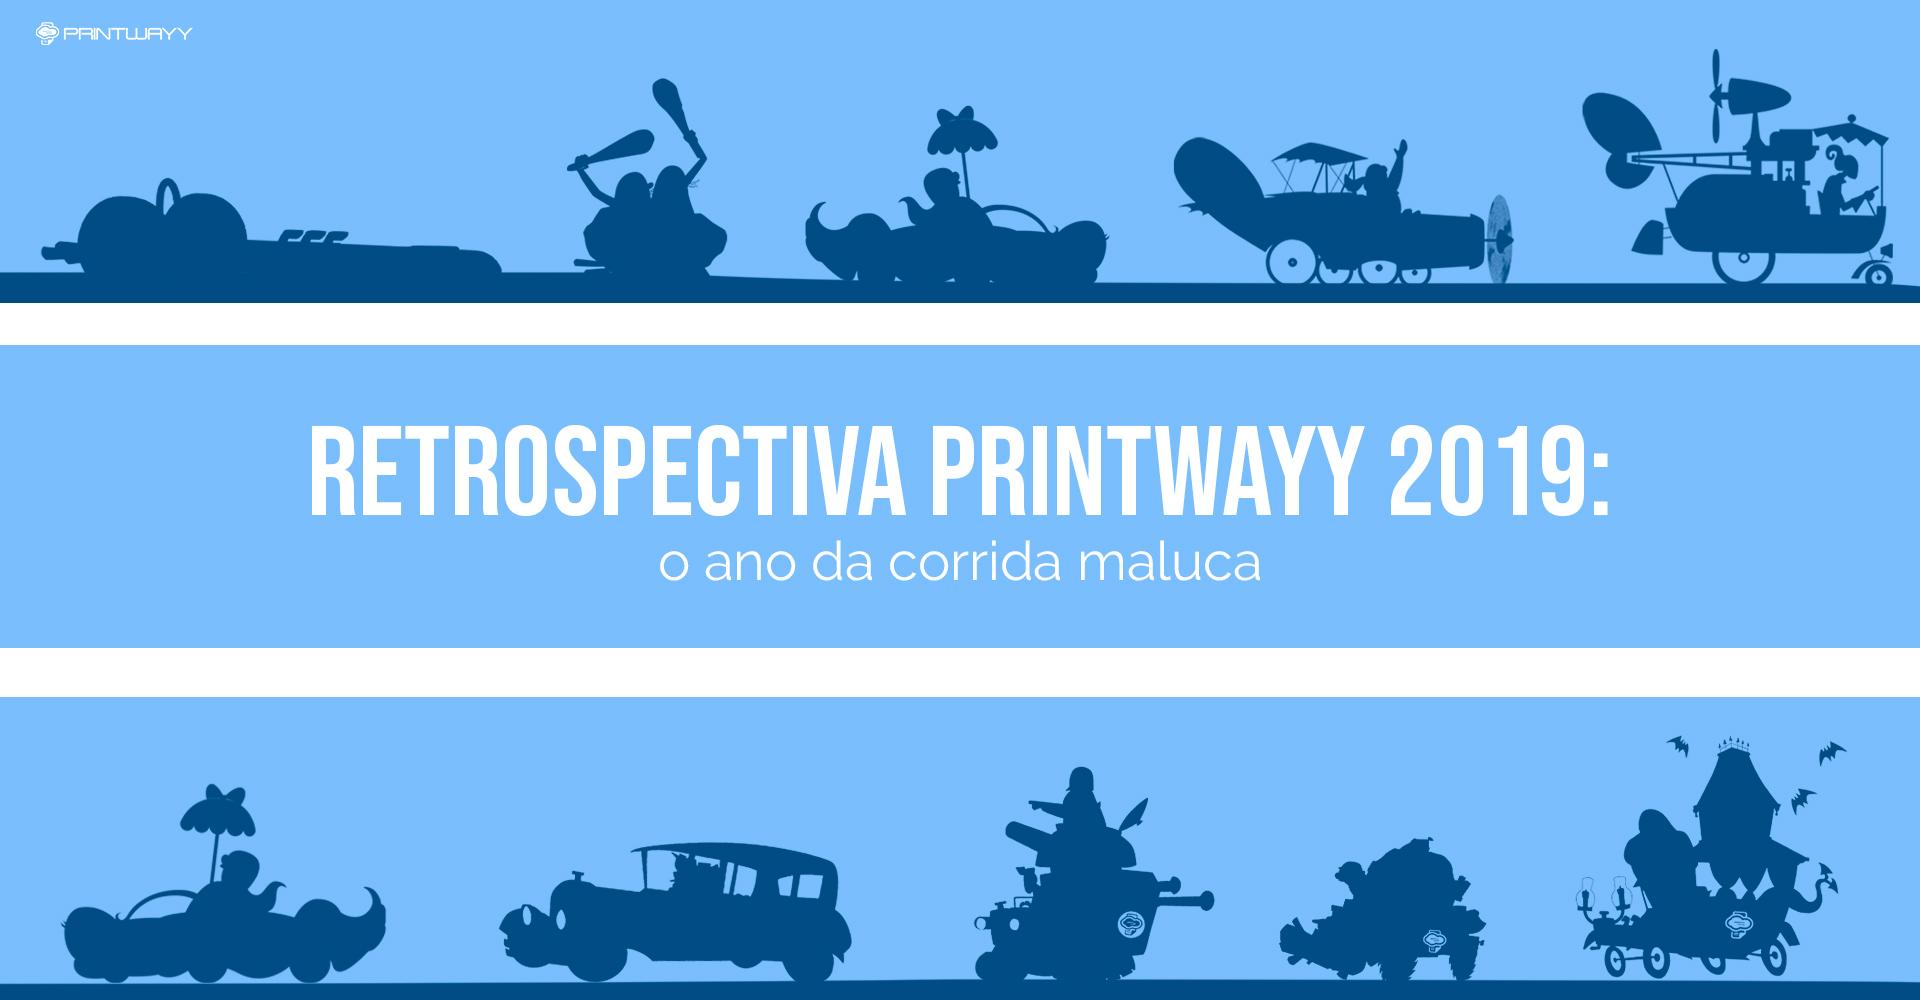 Convite para acessar a retrospectiva da PrintWayy 2019.